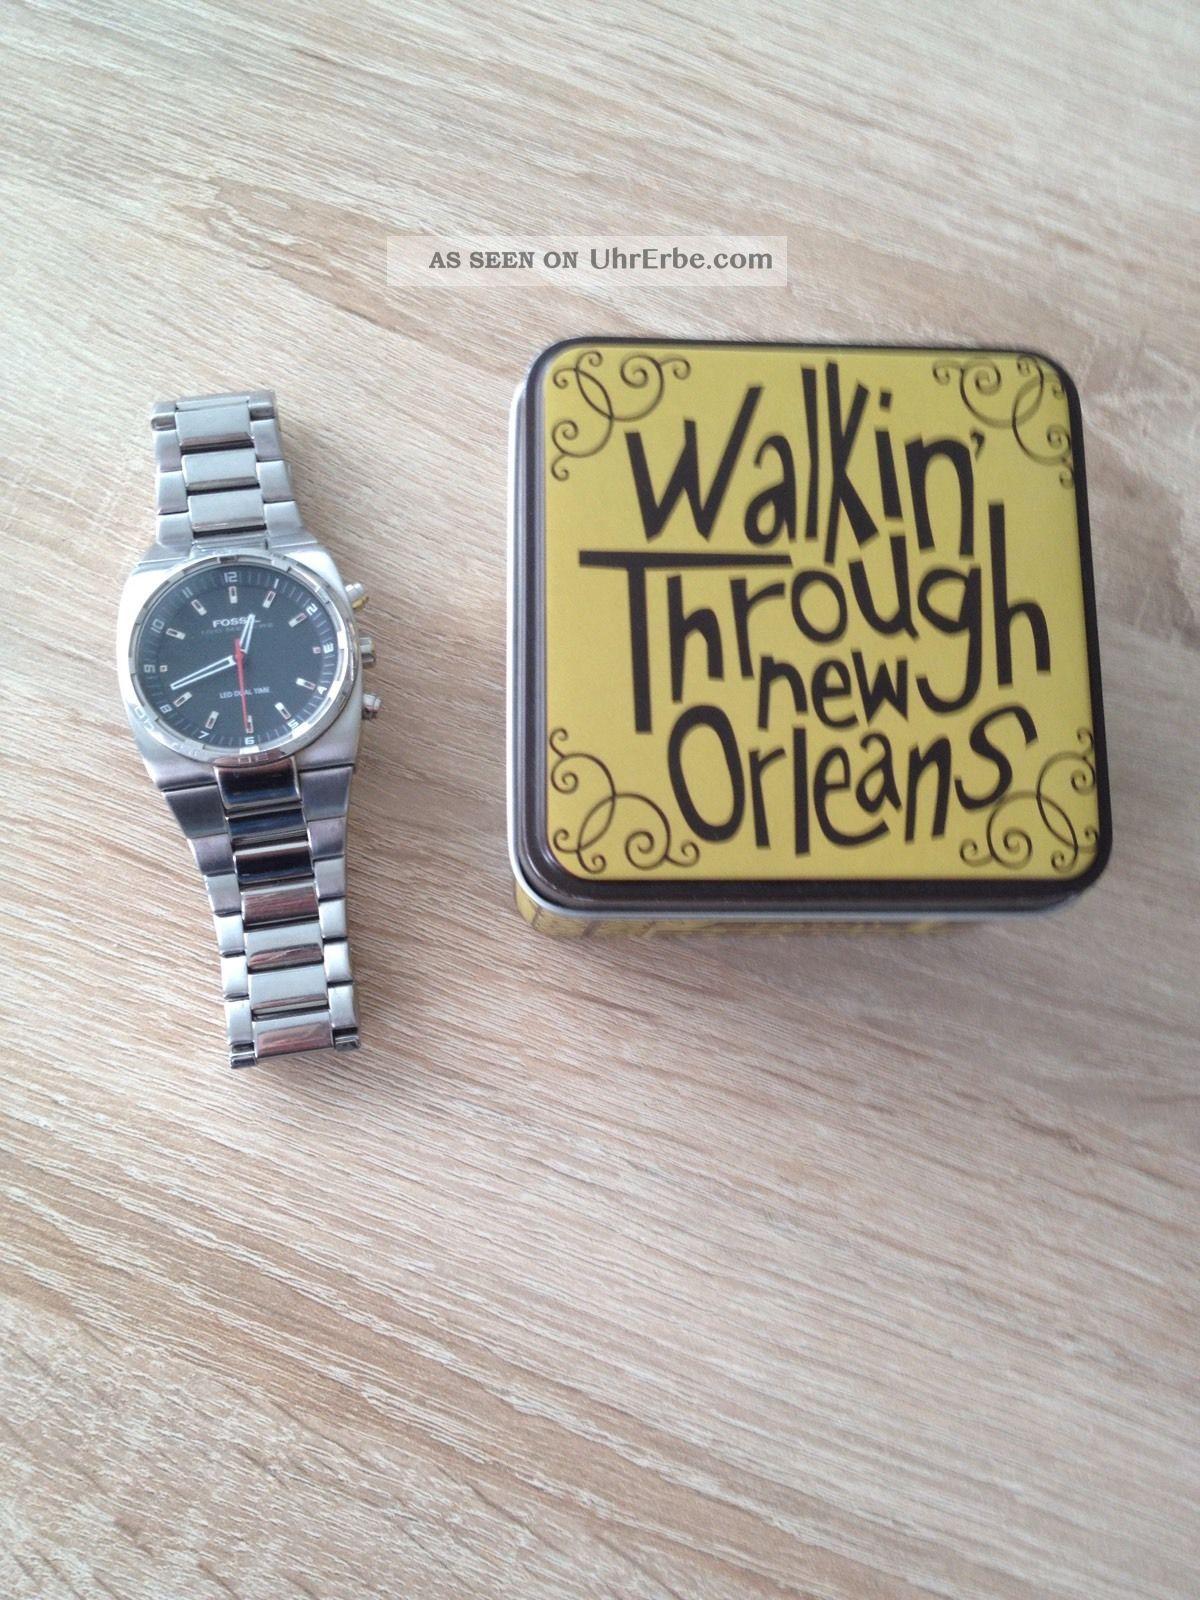 Fossil Herrenuhr / Led Dual Time / Seltene Uhr Armbanduhren Bild